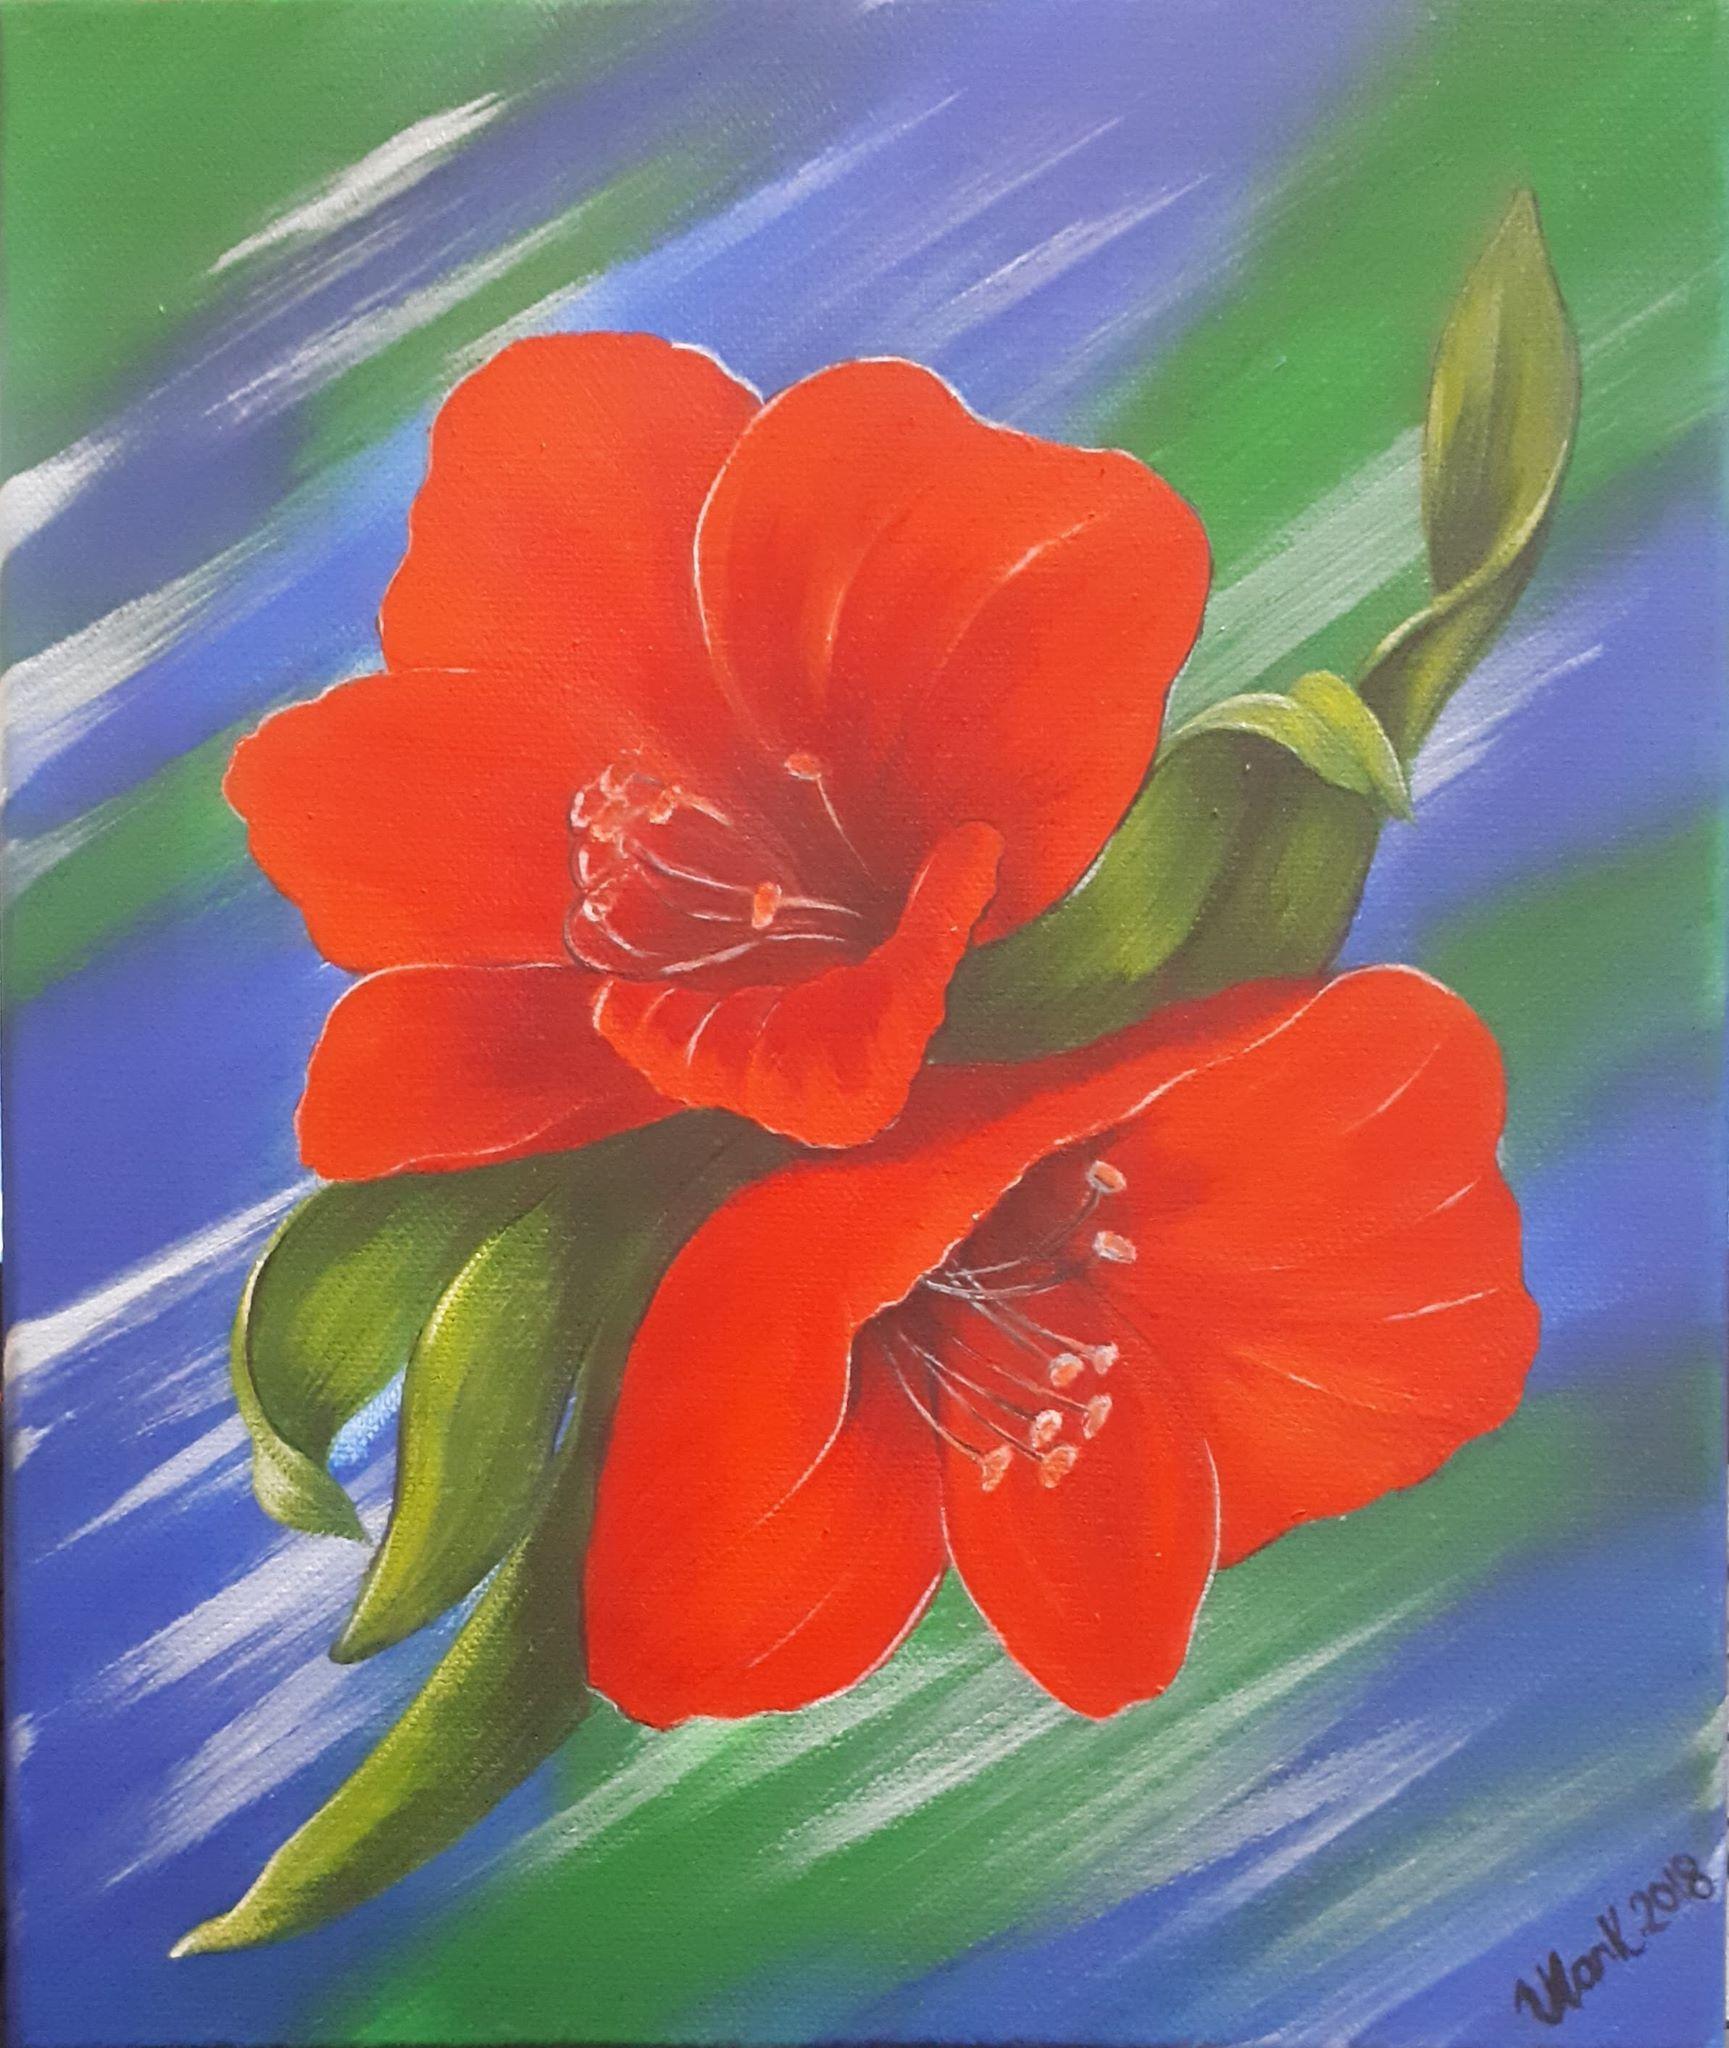 Amaryllis flower Lily 3Acrylic painting on canvas 24